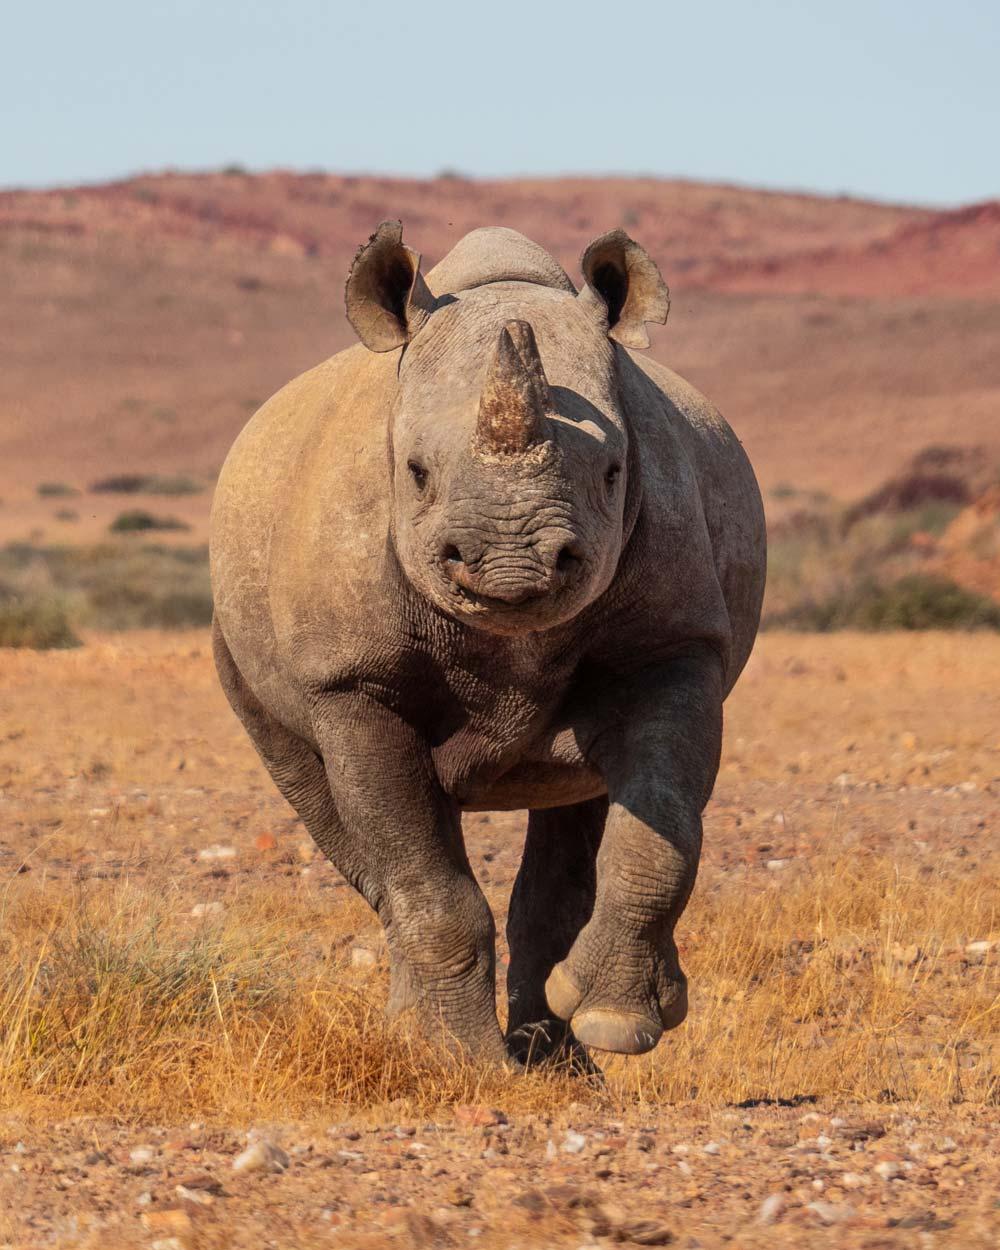 rhino-namibia-botswana-safari-frank.jpg